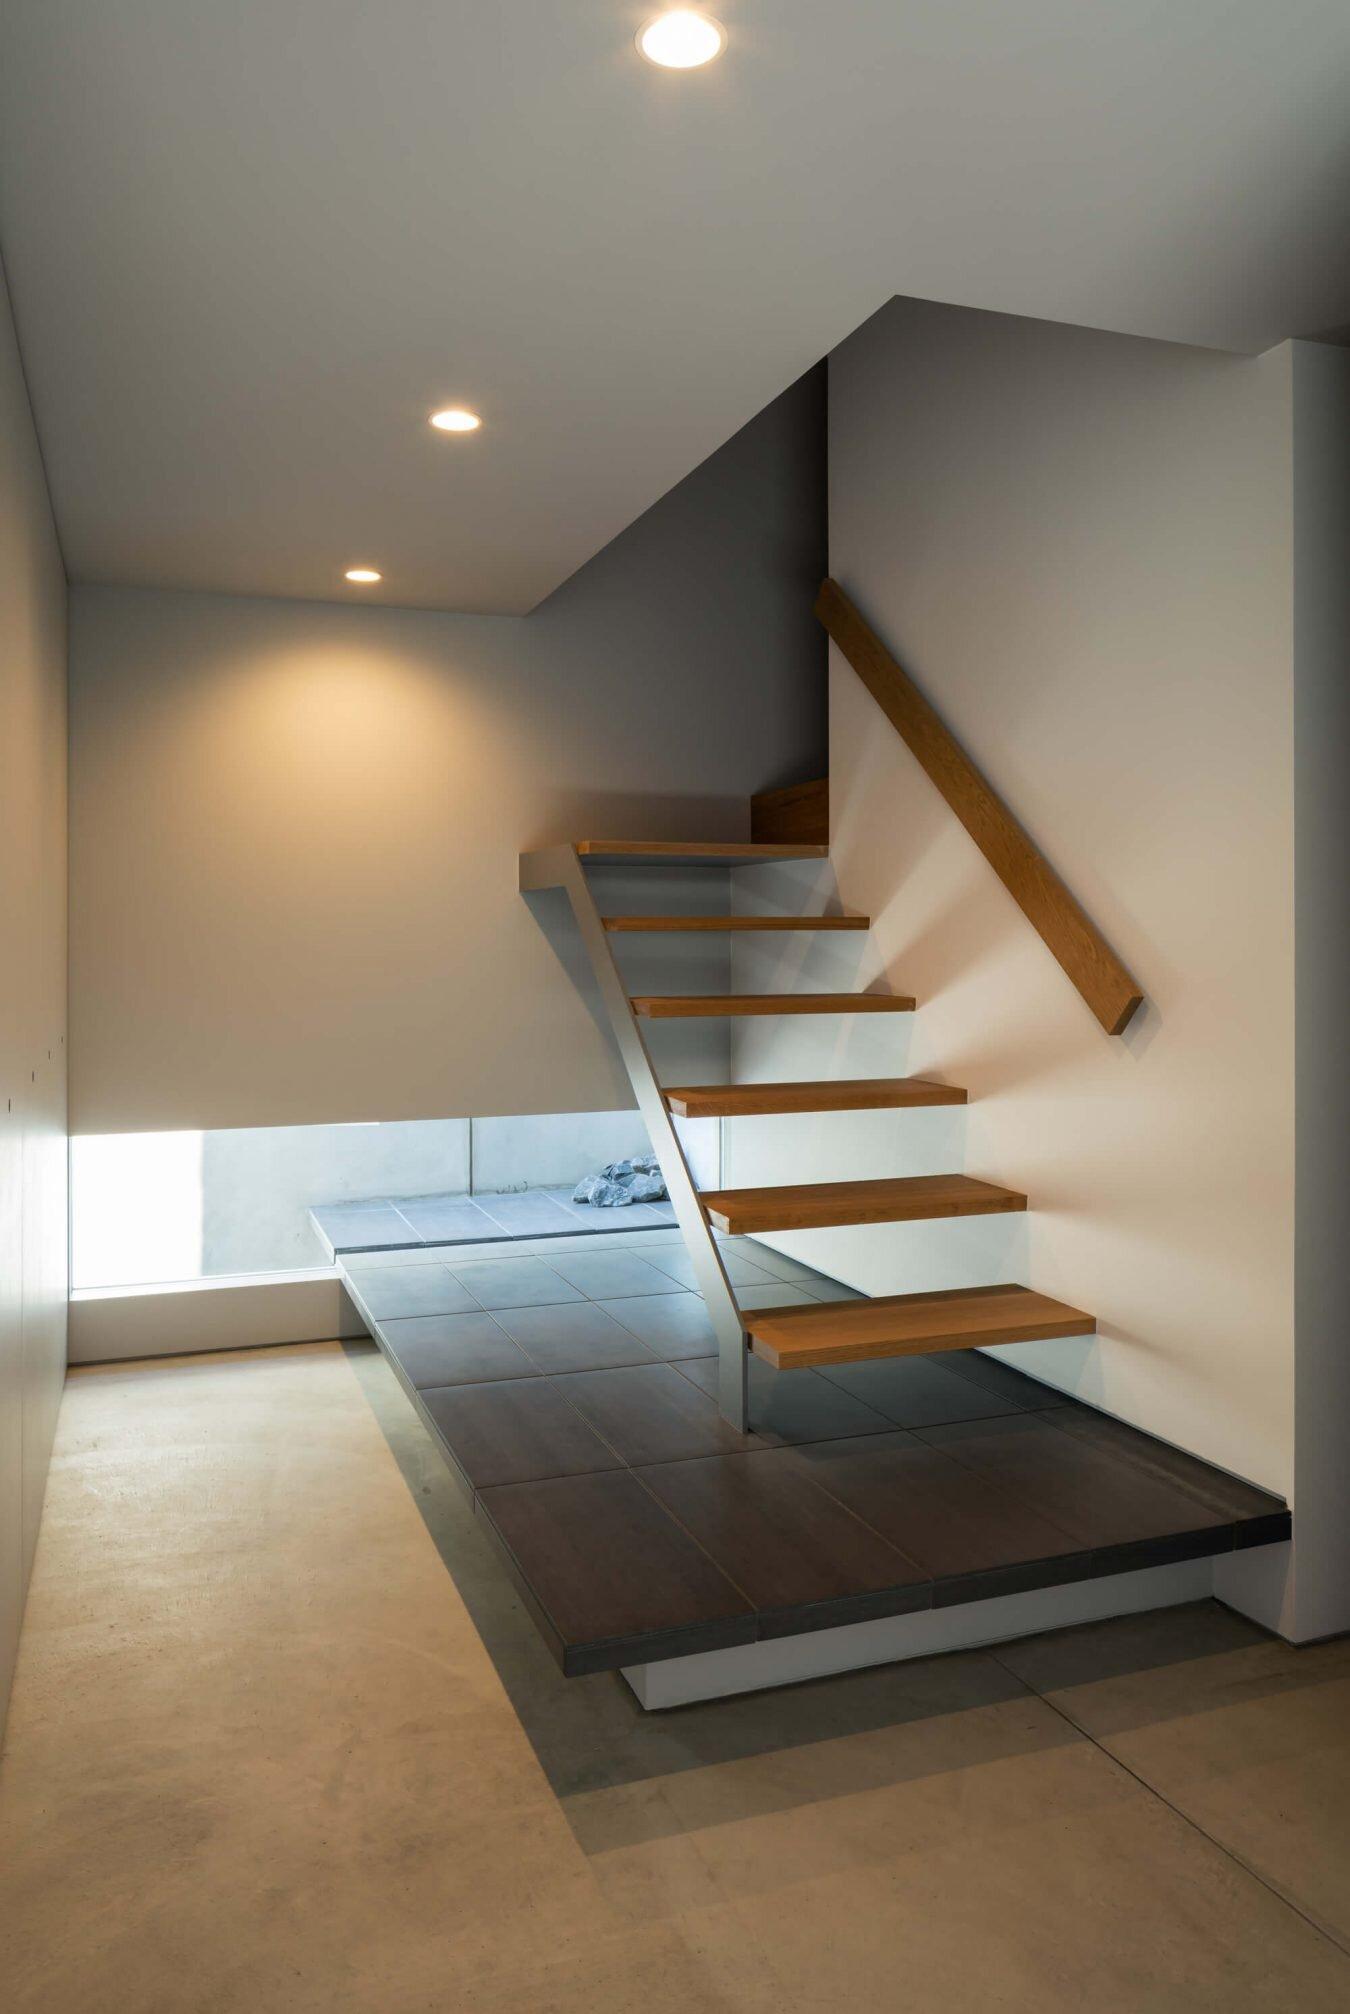 Horibe Associates Create a Home for a Car Enthusiast in Japan